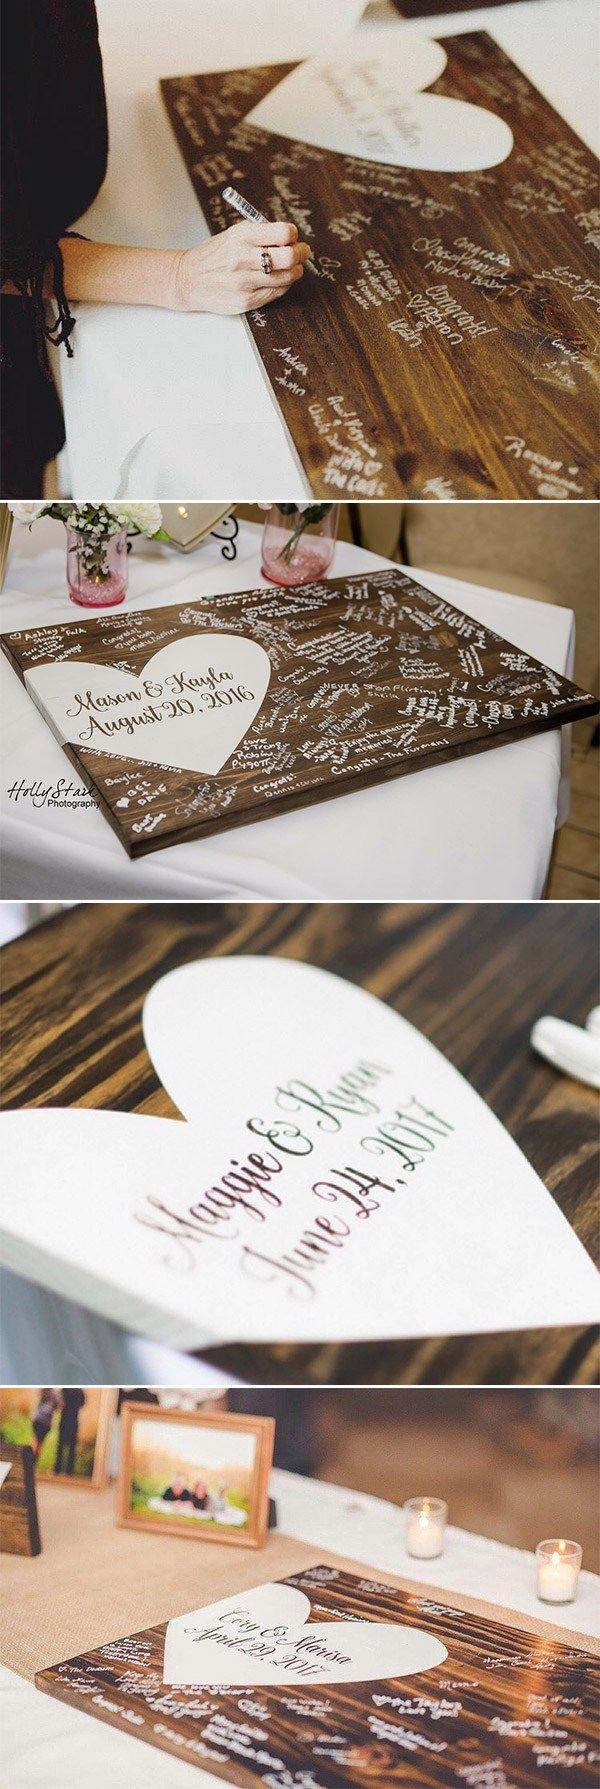 20 Rustic Wedding Guest Book Ideas